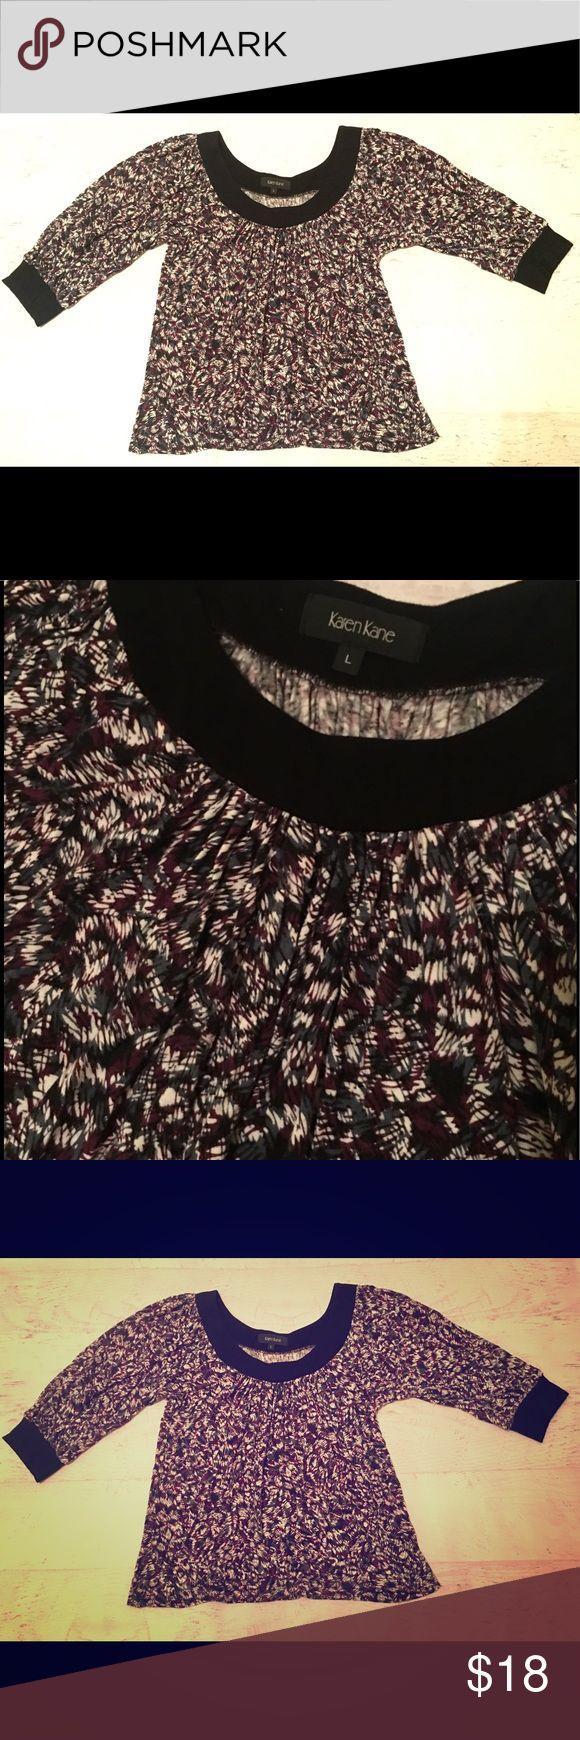 Karen Kane flowy top! Super soft!! 🤗🤗🎀❤️ Karen Kane flowy casual top. Sooo soft and flattering! Size Large Karen Kane Tops Blouses